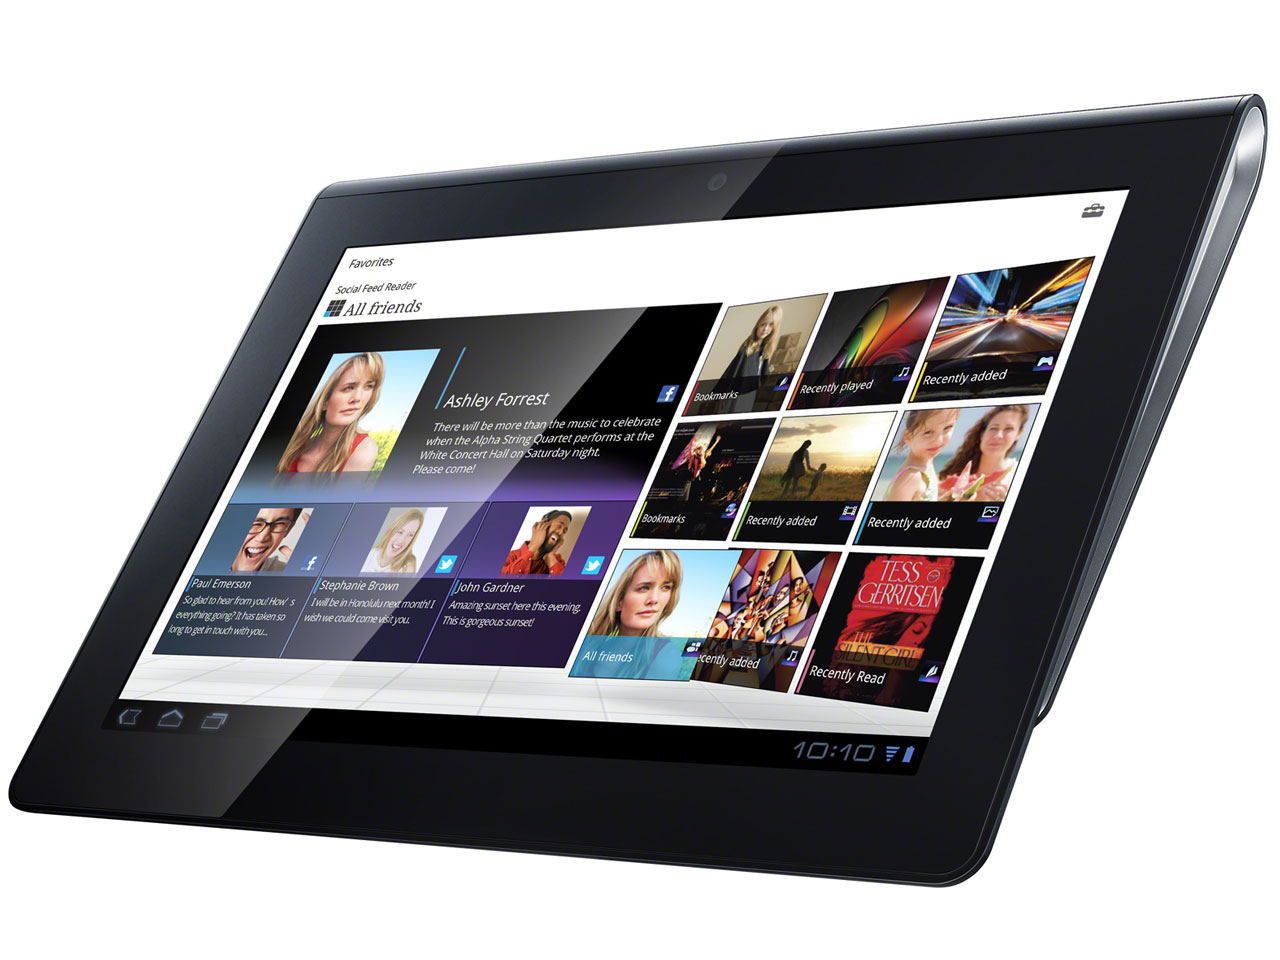 Sony Tablet S�V���[�Y 3G+Wi-Fi���f�� 16GB SGPT113JP/S �̐��i�摜